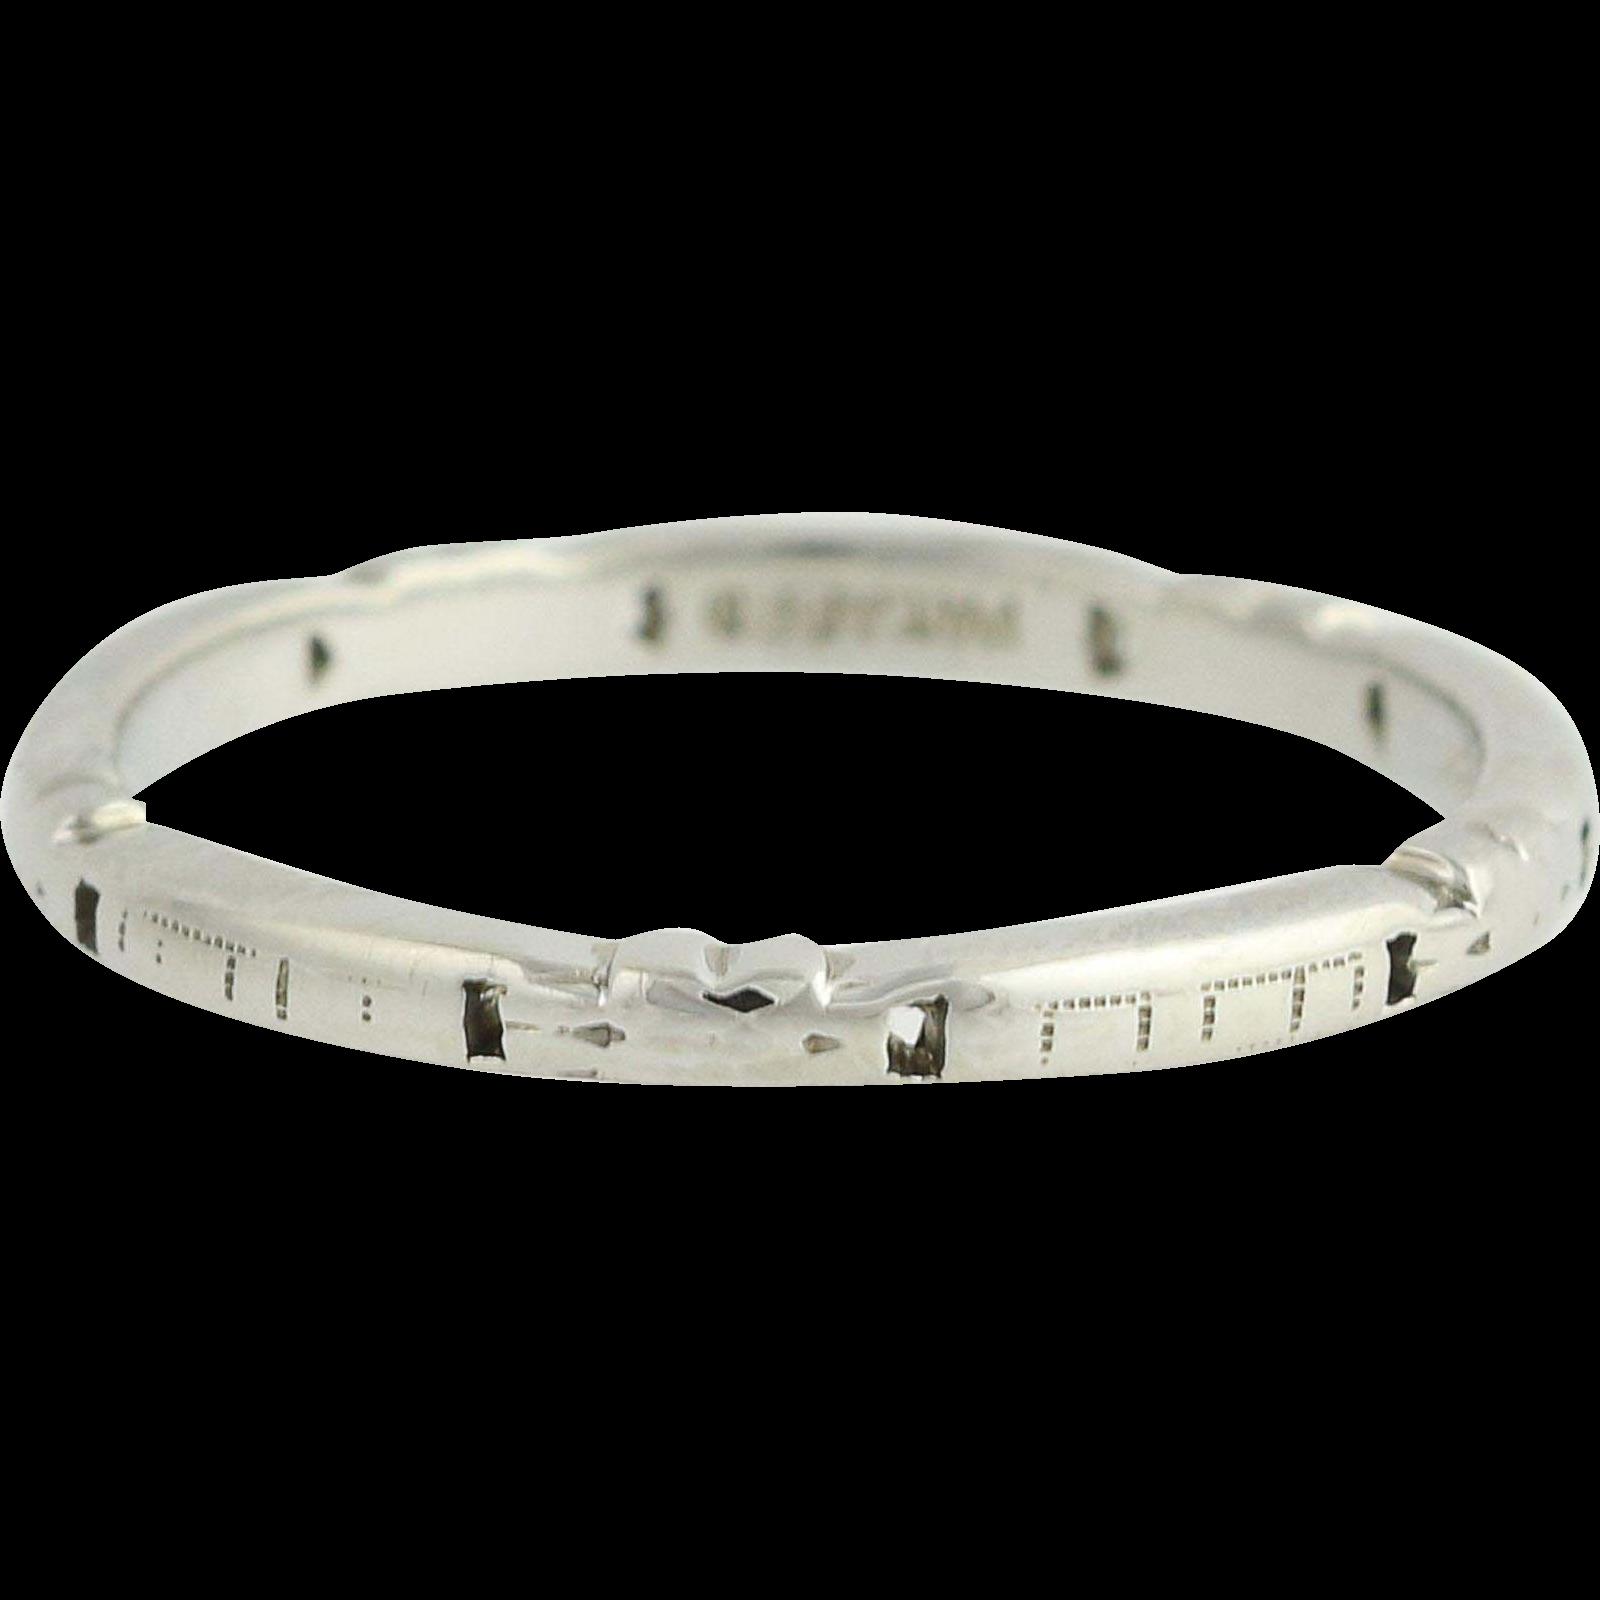 Art Deco Band Ring - 18k White Gold Vintage Pattern Women's Size 5